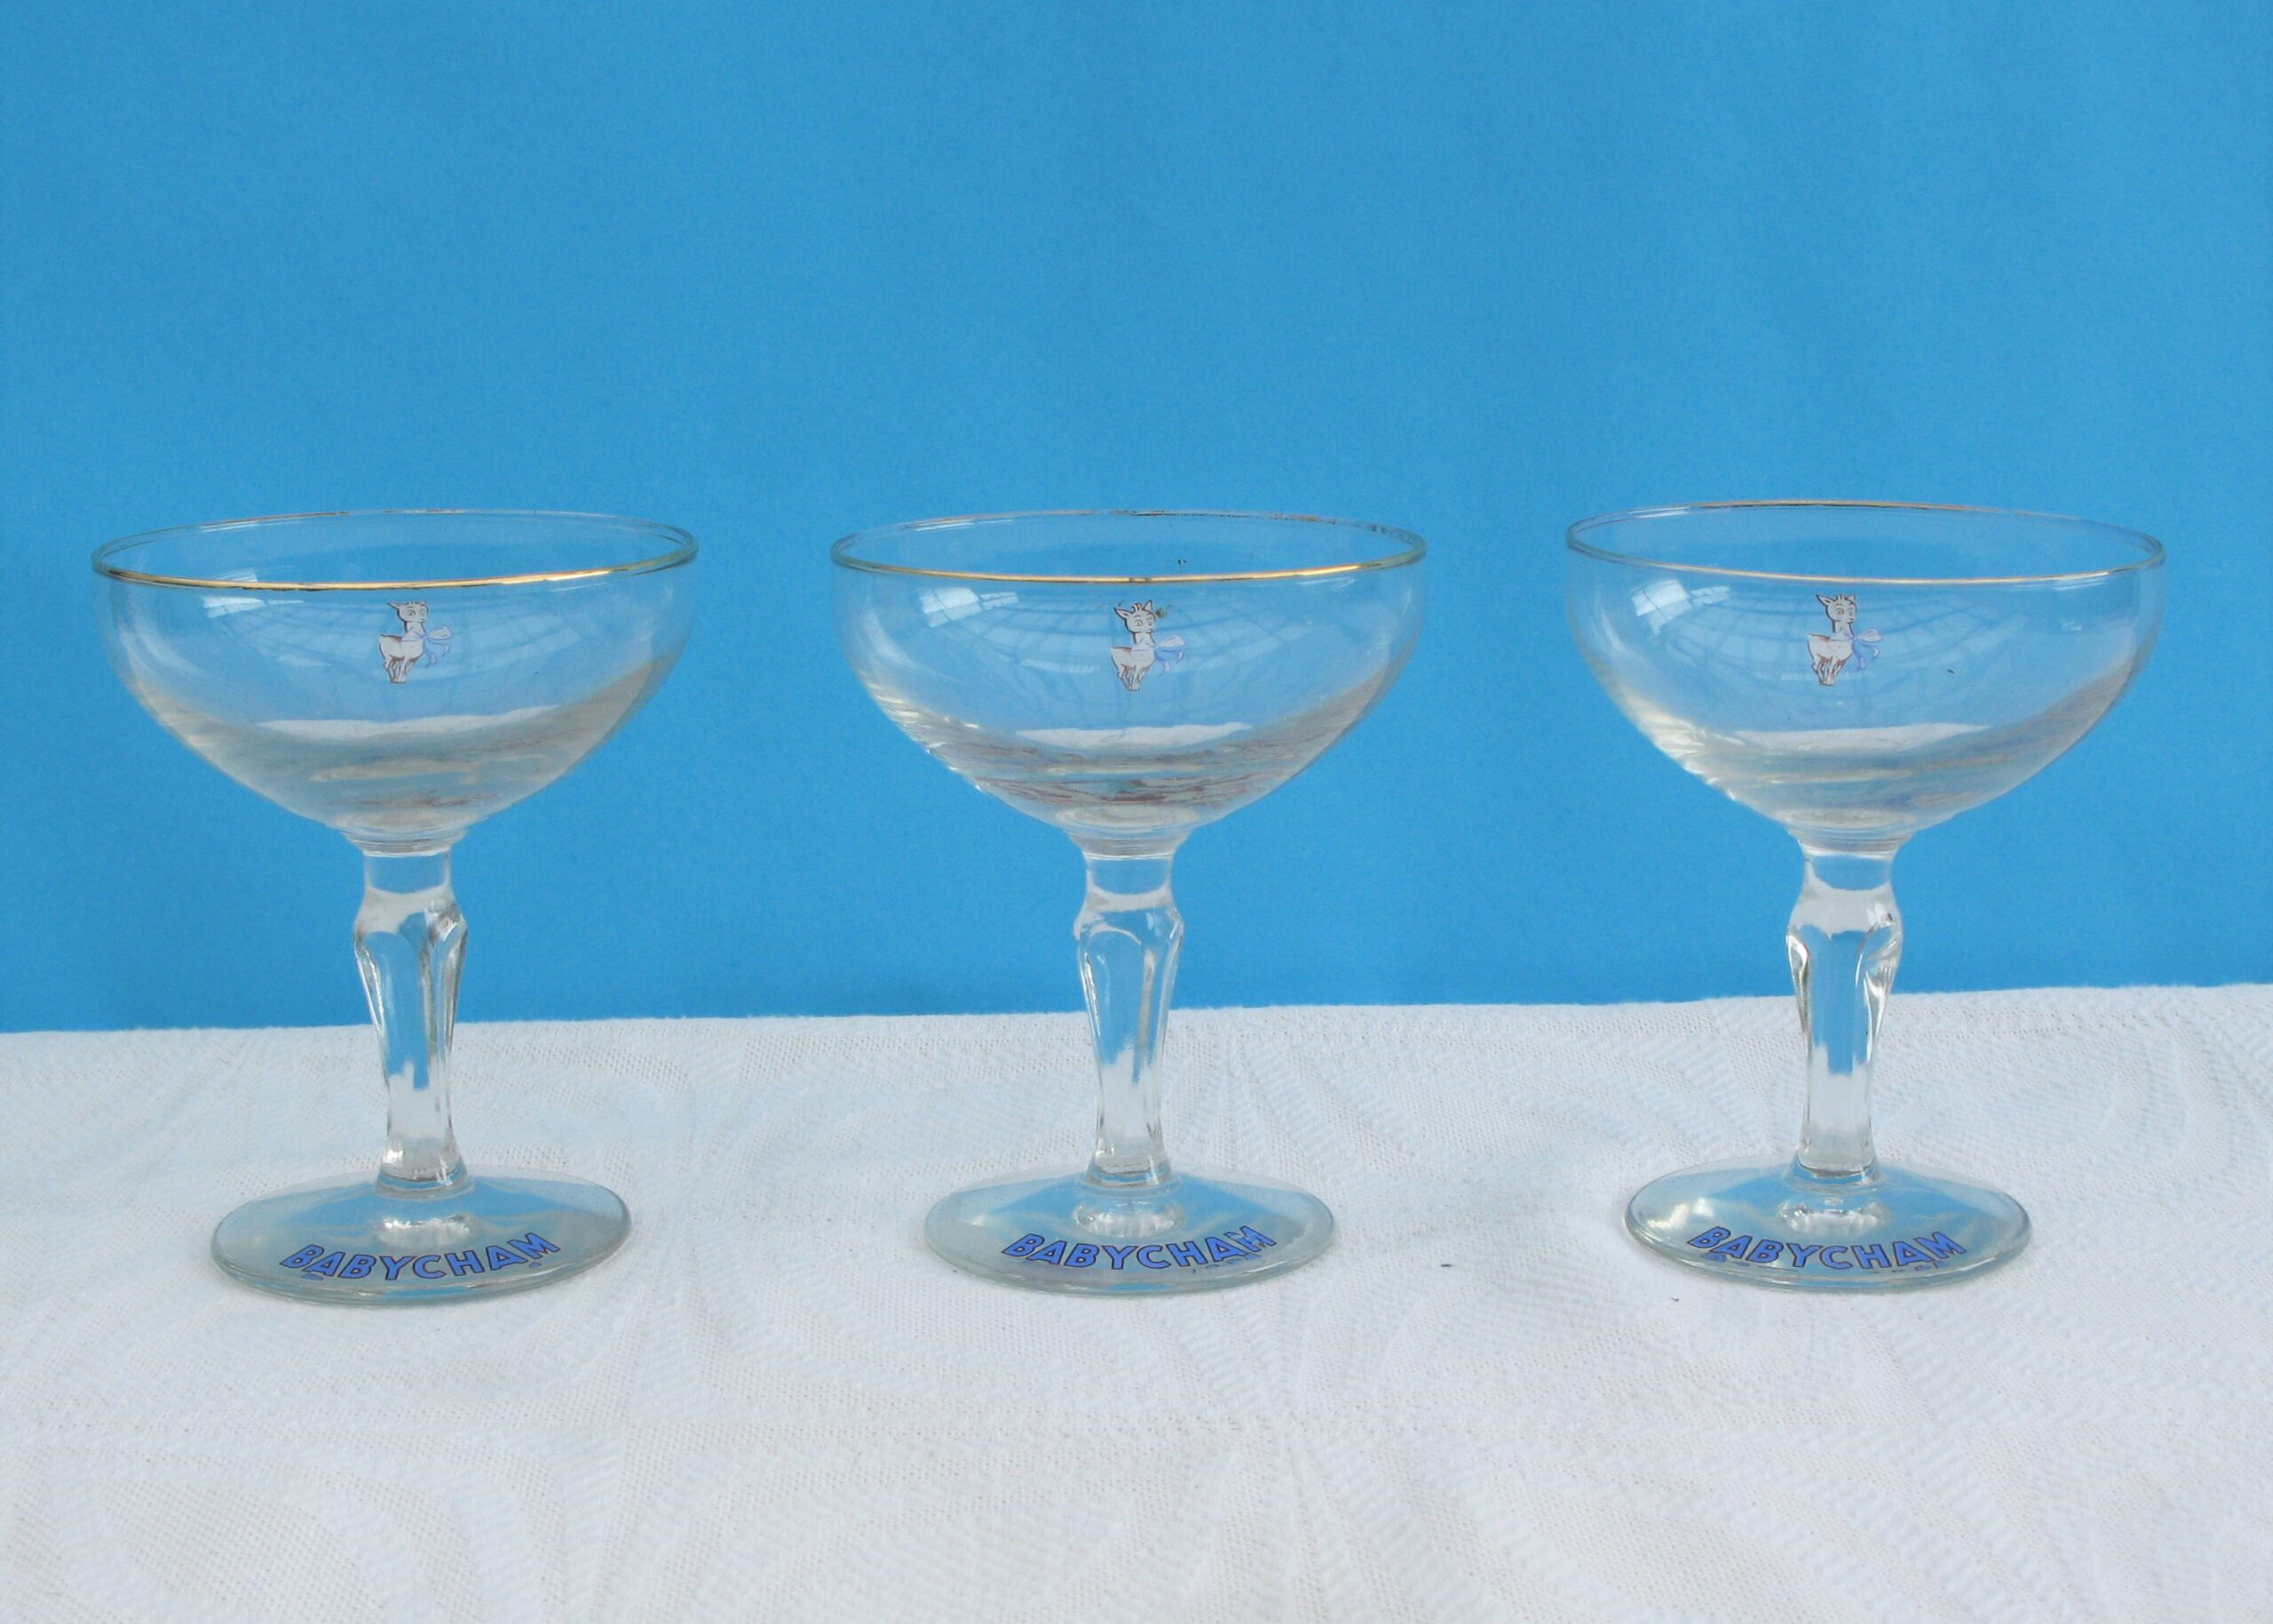 Vintage Rare Babycham Glasses 1950s White Fawn Hexagonal Stem - 3 Available